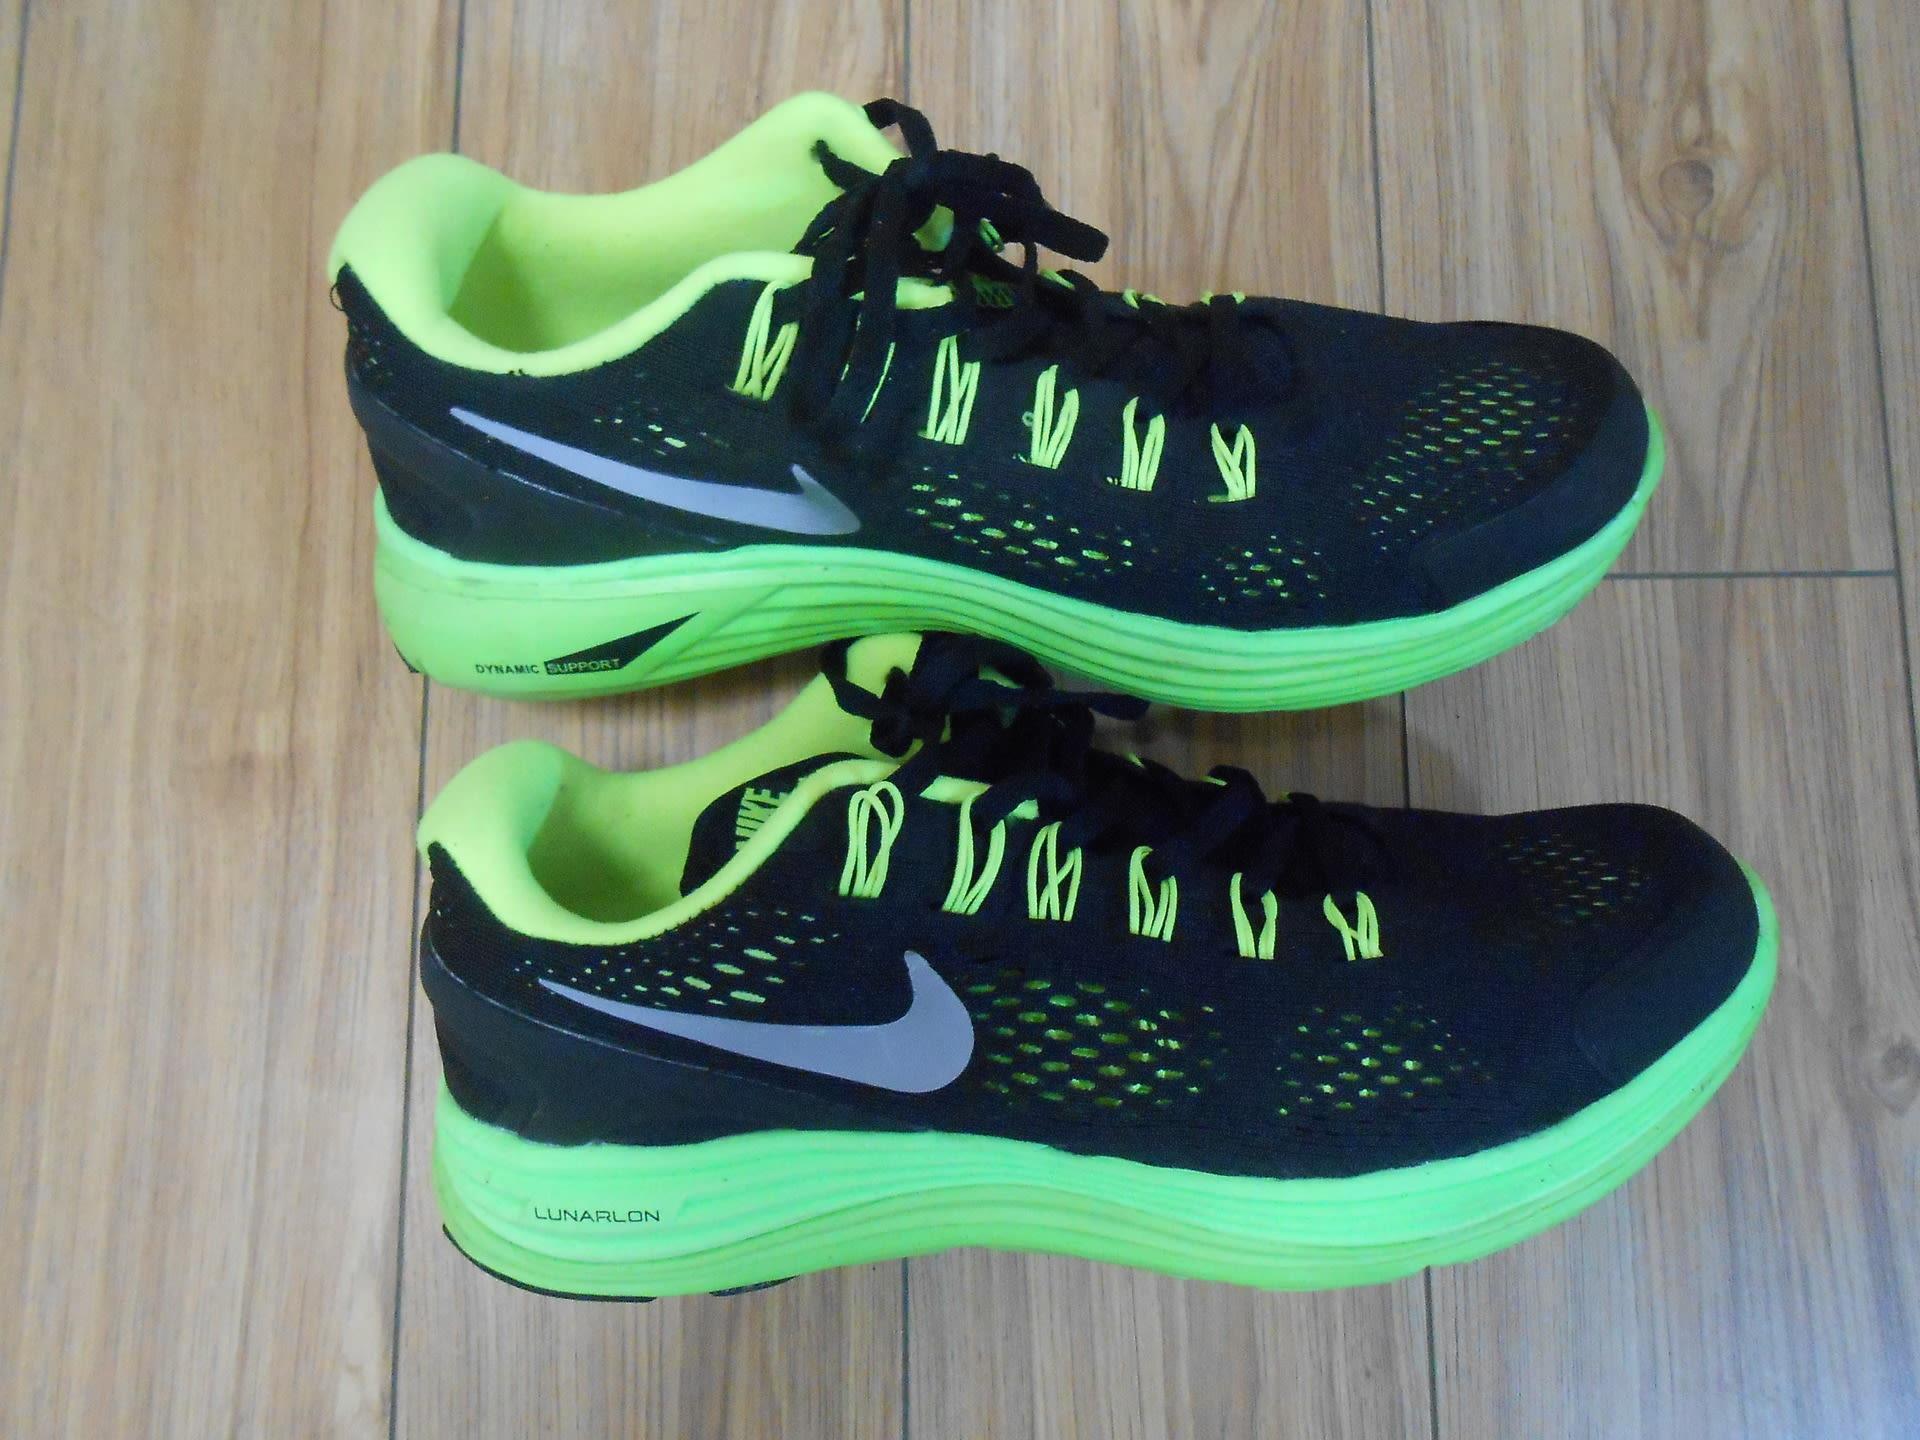 Nike Libre 3 4 5 Différences Chinoises